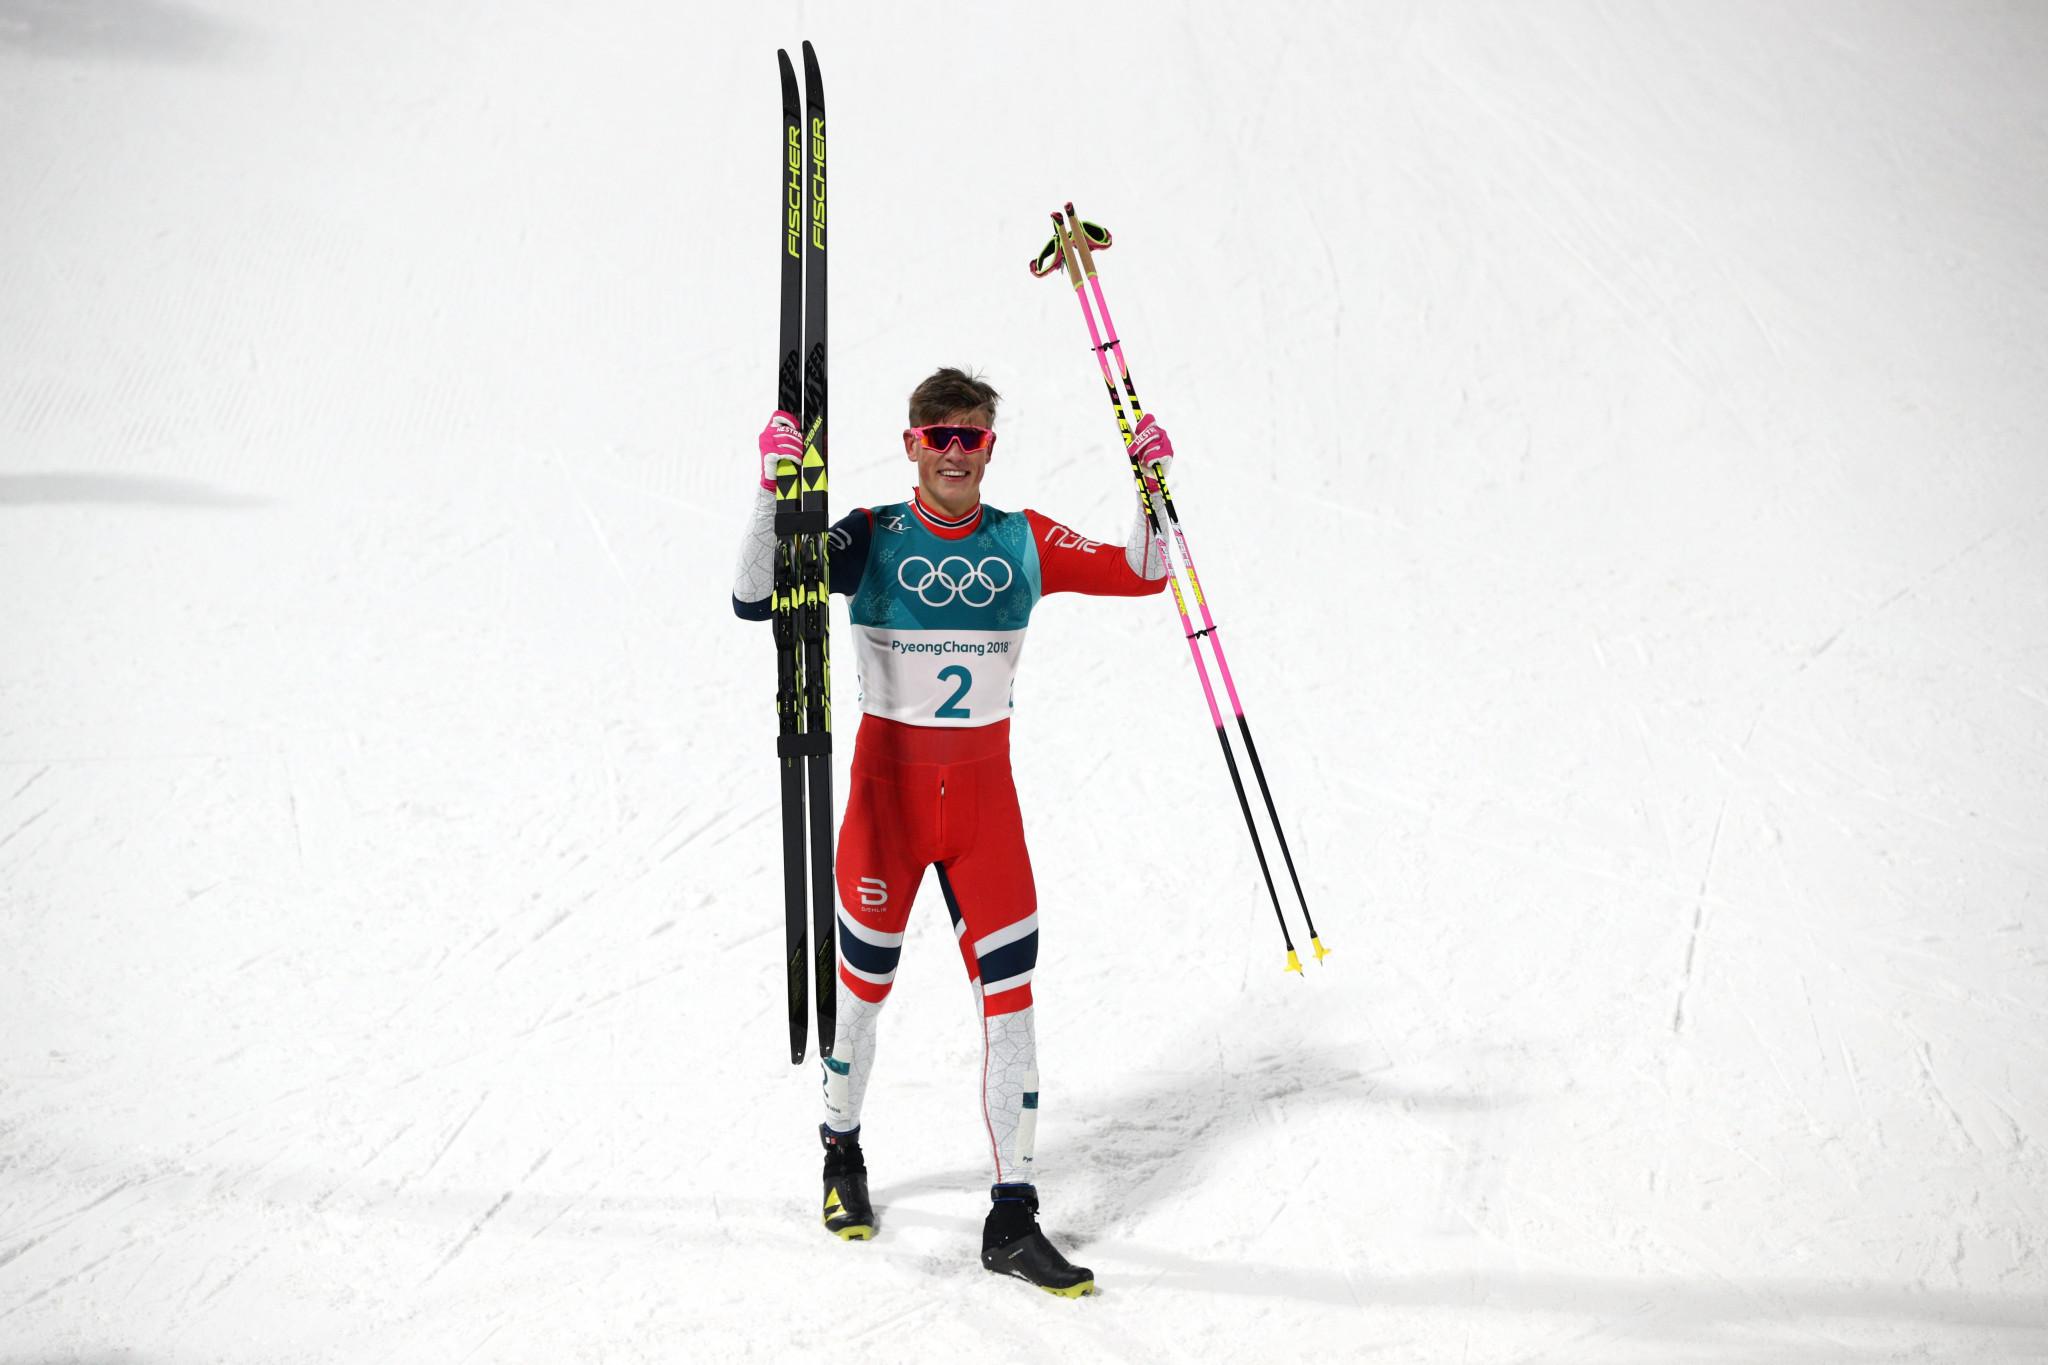 Johannes Hoesflot Klaebo celebrates his men's victory at Pyeongchang 2018 ©Getty Images